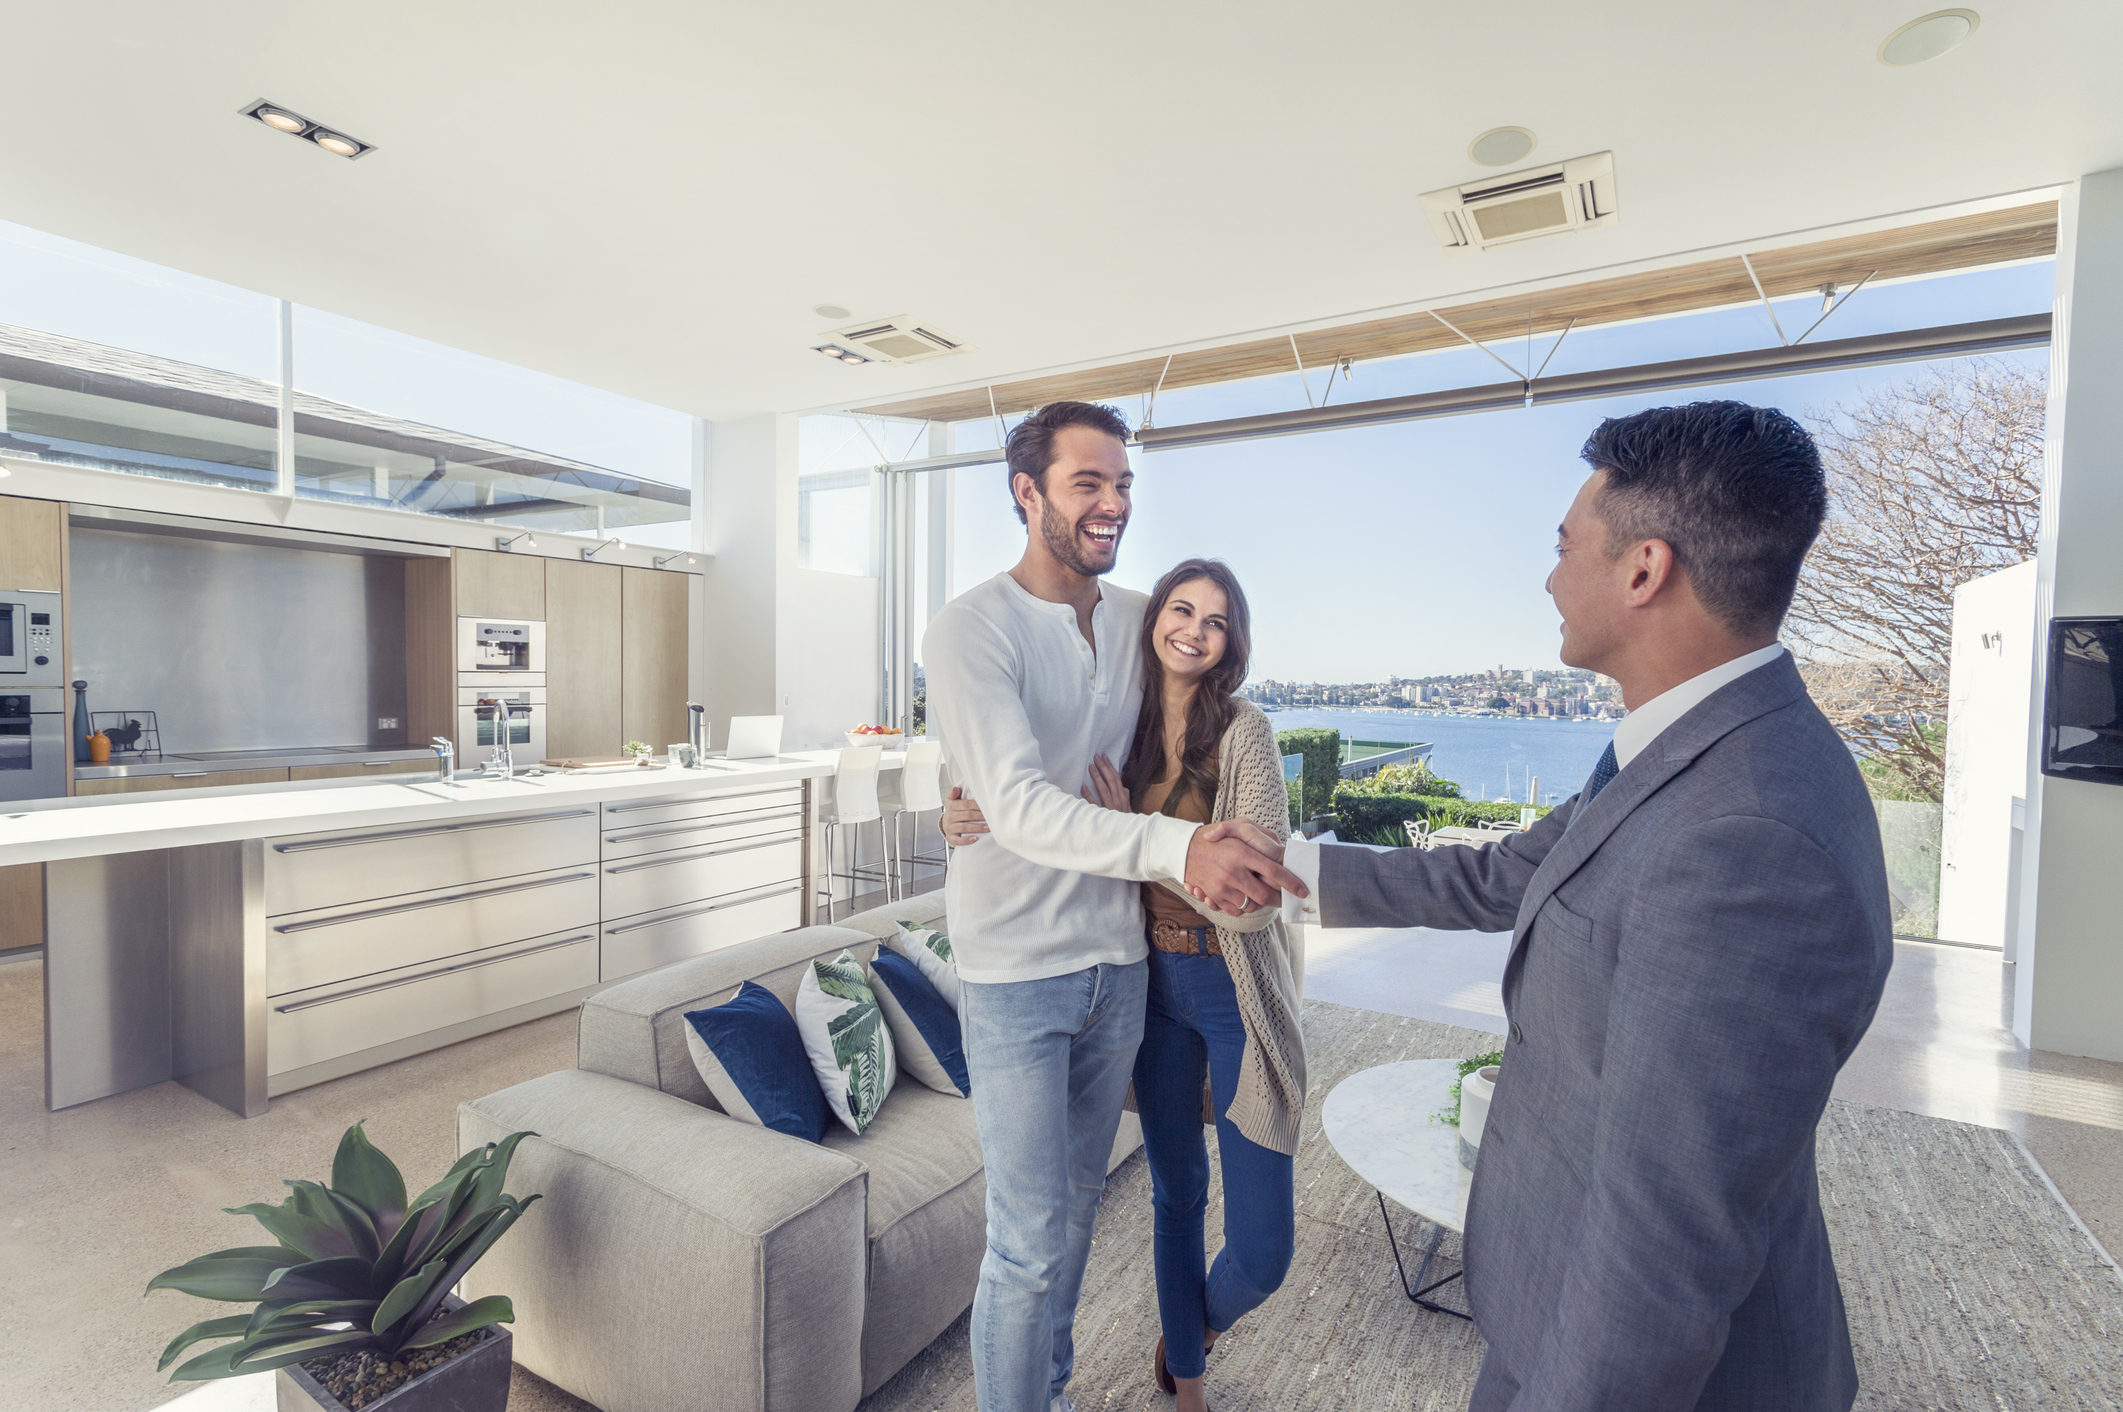 Investissement immobilier : comment éviter une arnaque?